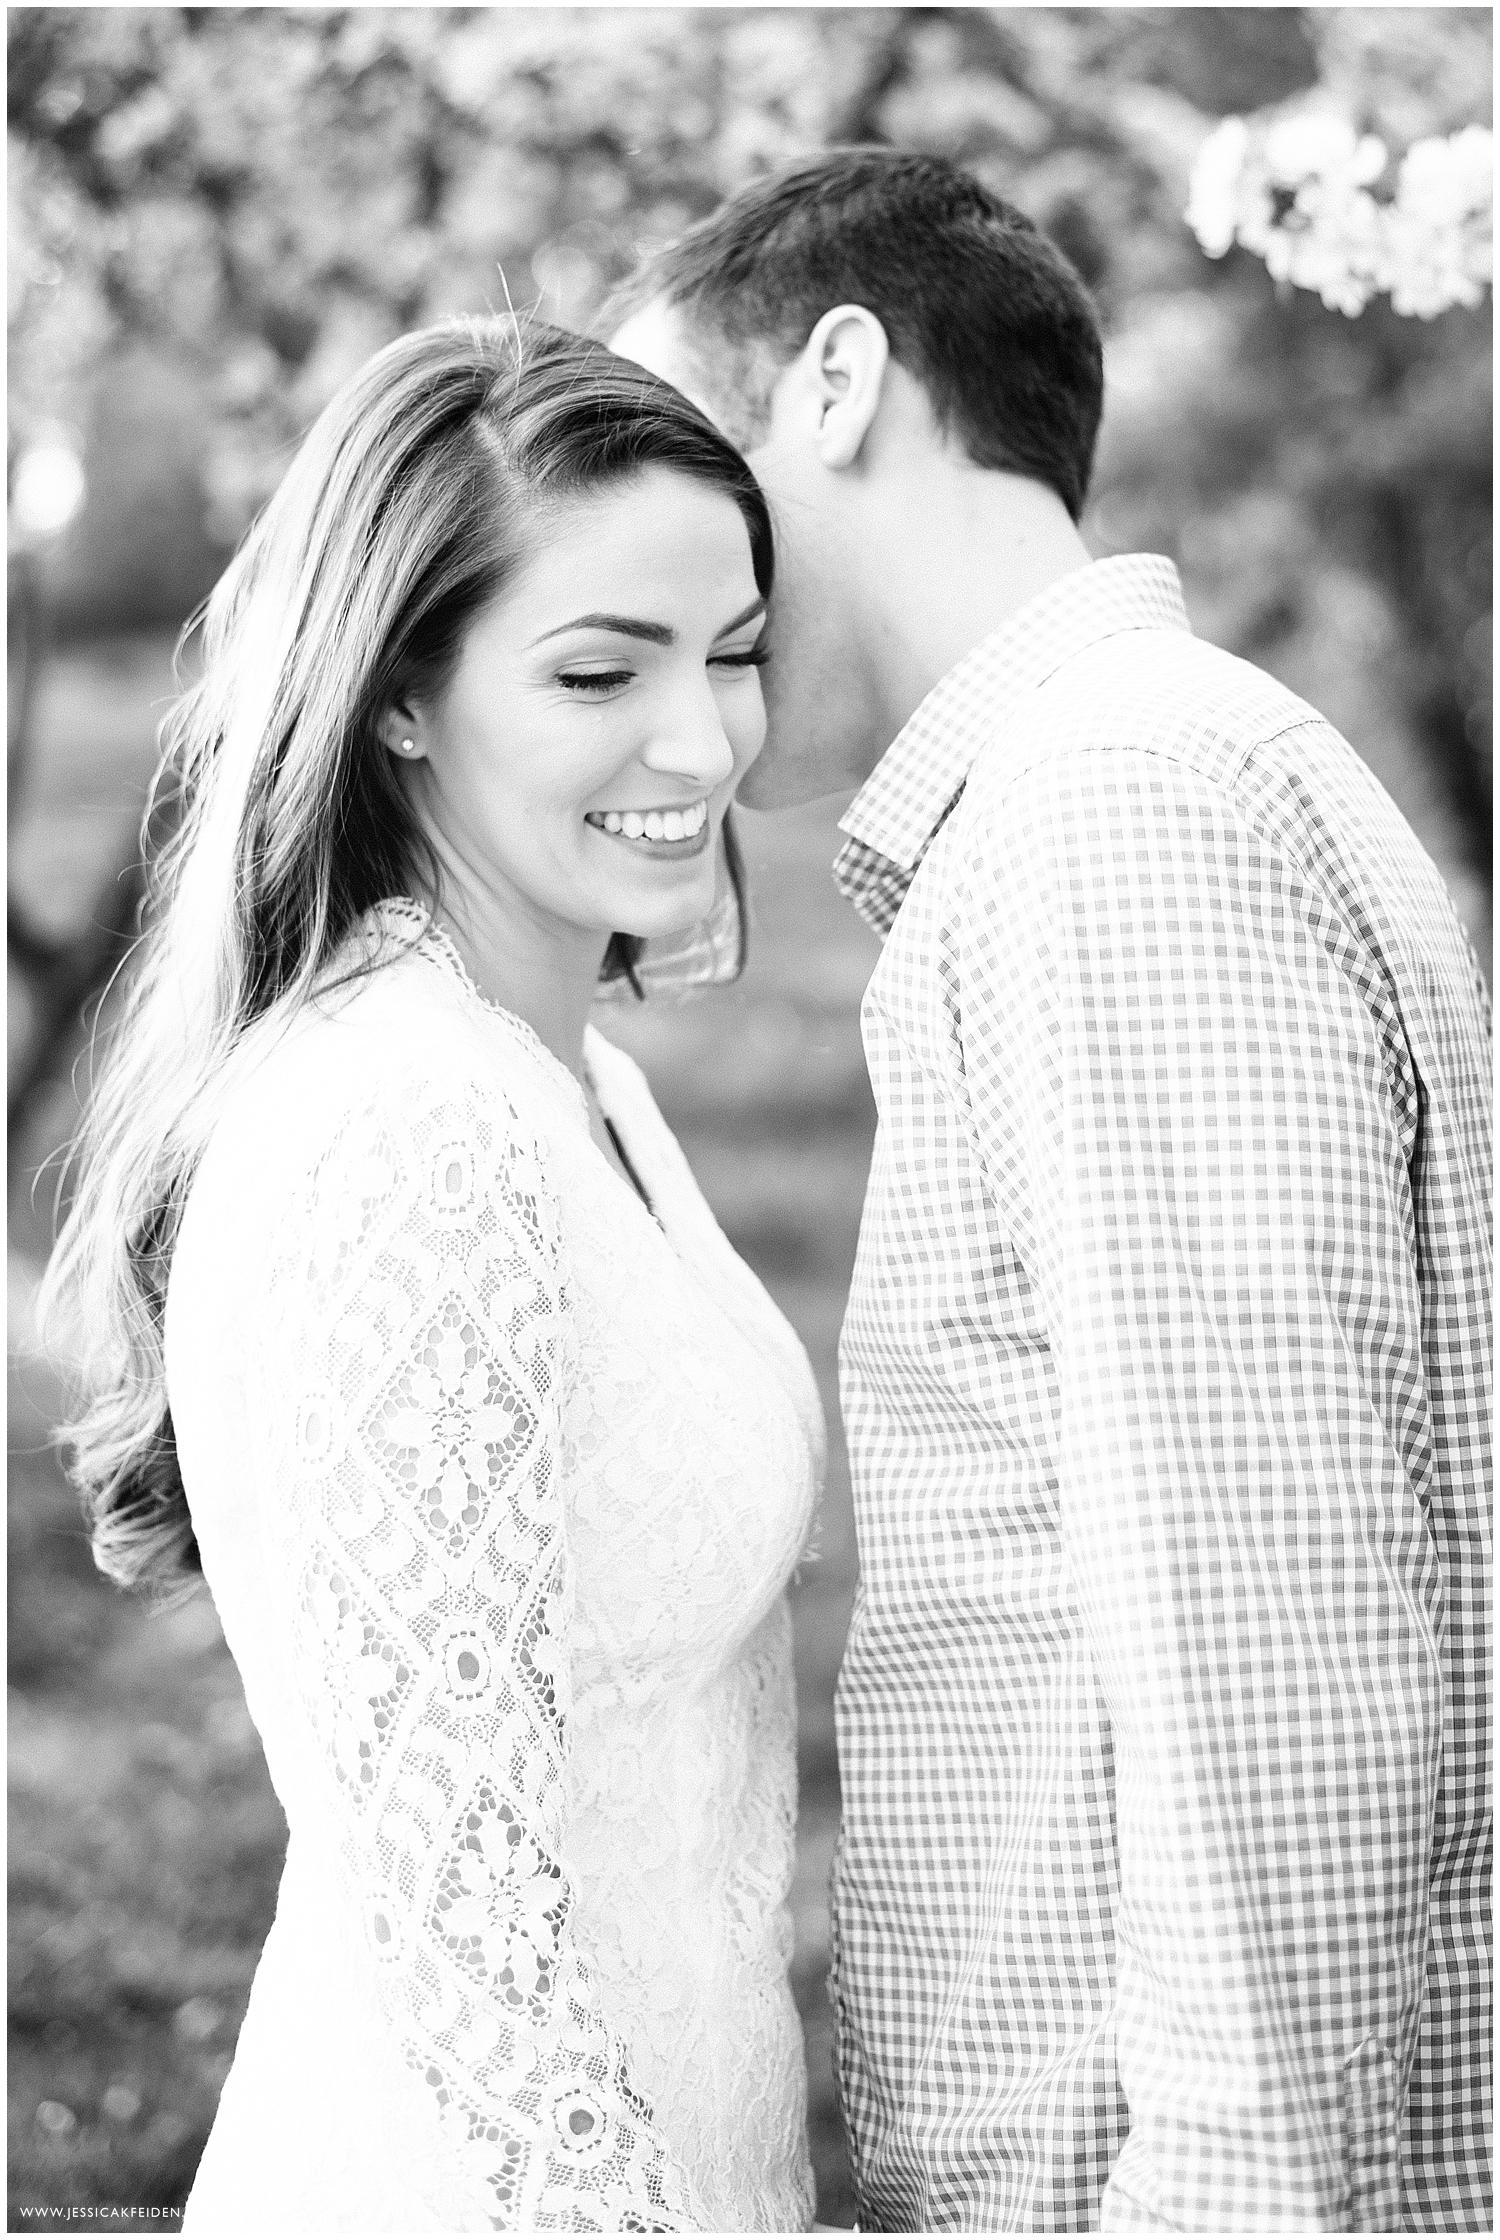 Jessica K Feiden Photography_Larz Anderson Park Engagement Session Photographer_0017.jpg